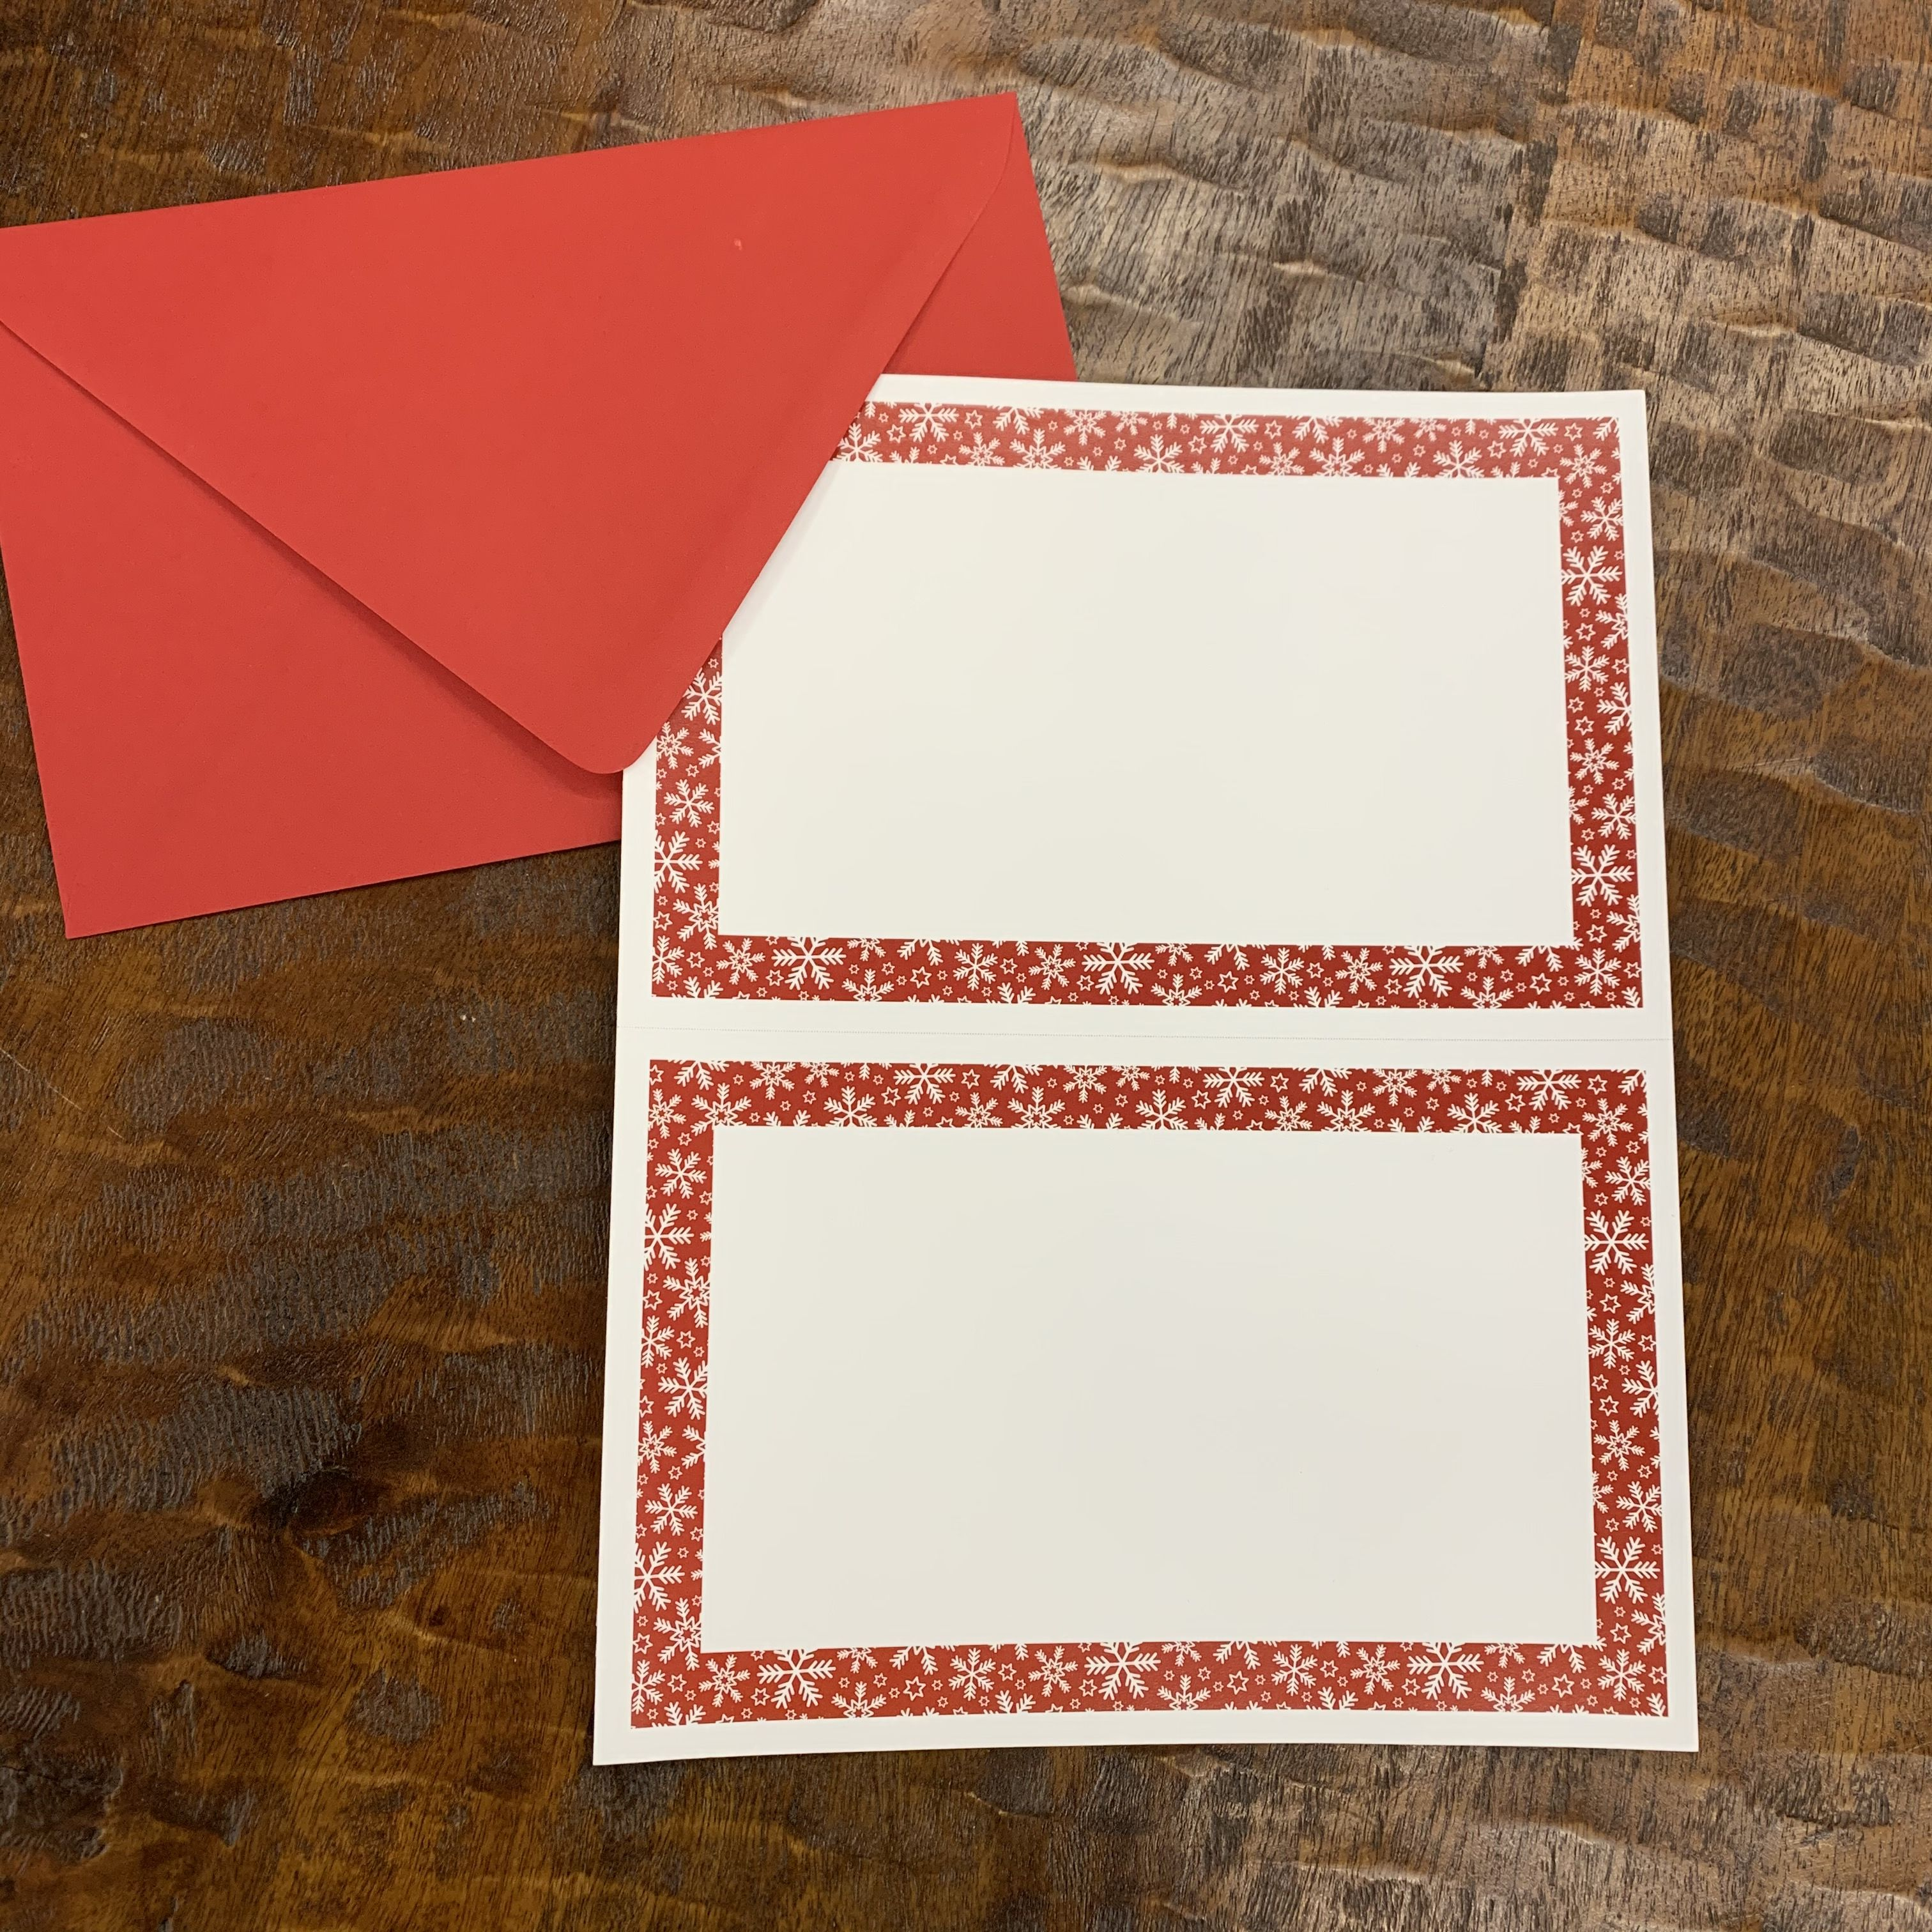 2 Up Invitation Red Flakes 25 Sheets 50 Invitations Holiday Etsy Snowflake Invitations Holiday Invitations Invitations